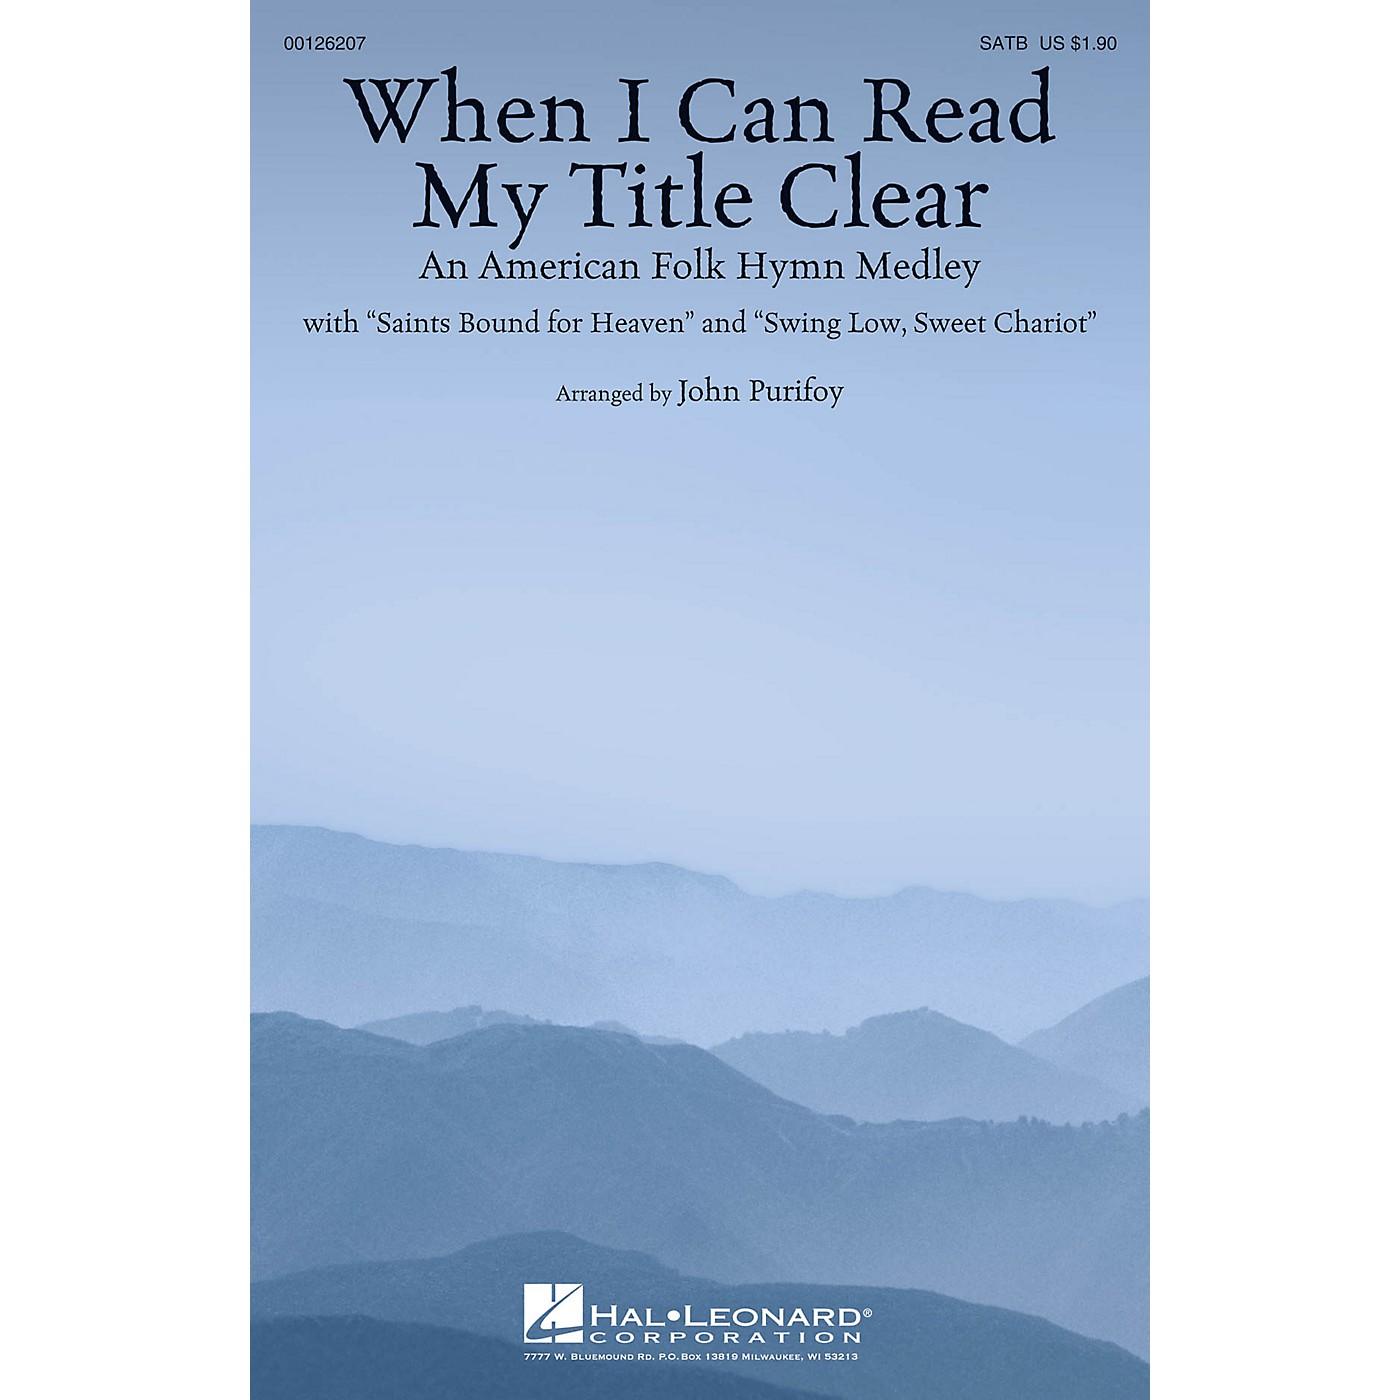 Hal Leonard When I Can Read My Title Clear (An American Folk Hymn Medley) SATB arranged by John Purifoy thumbnail